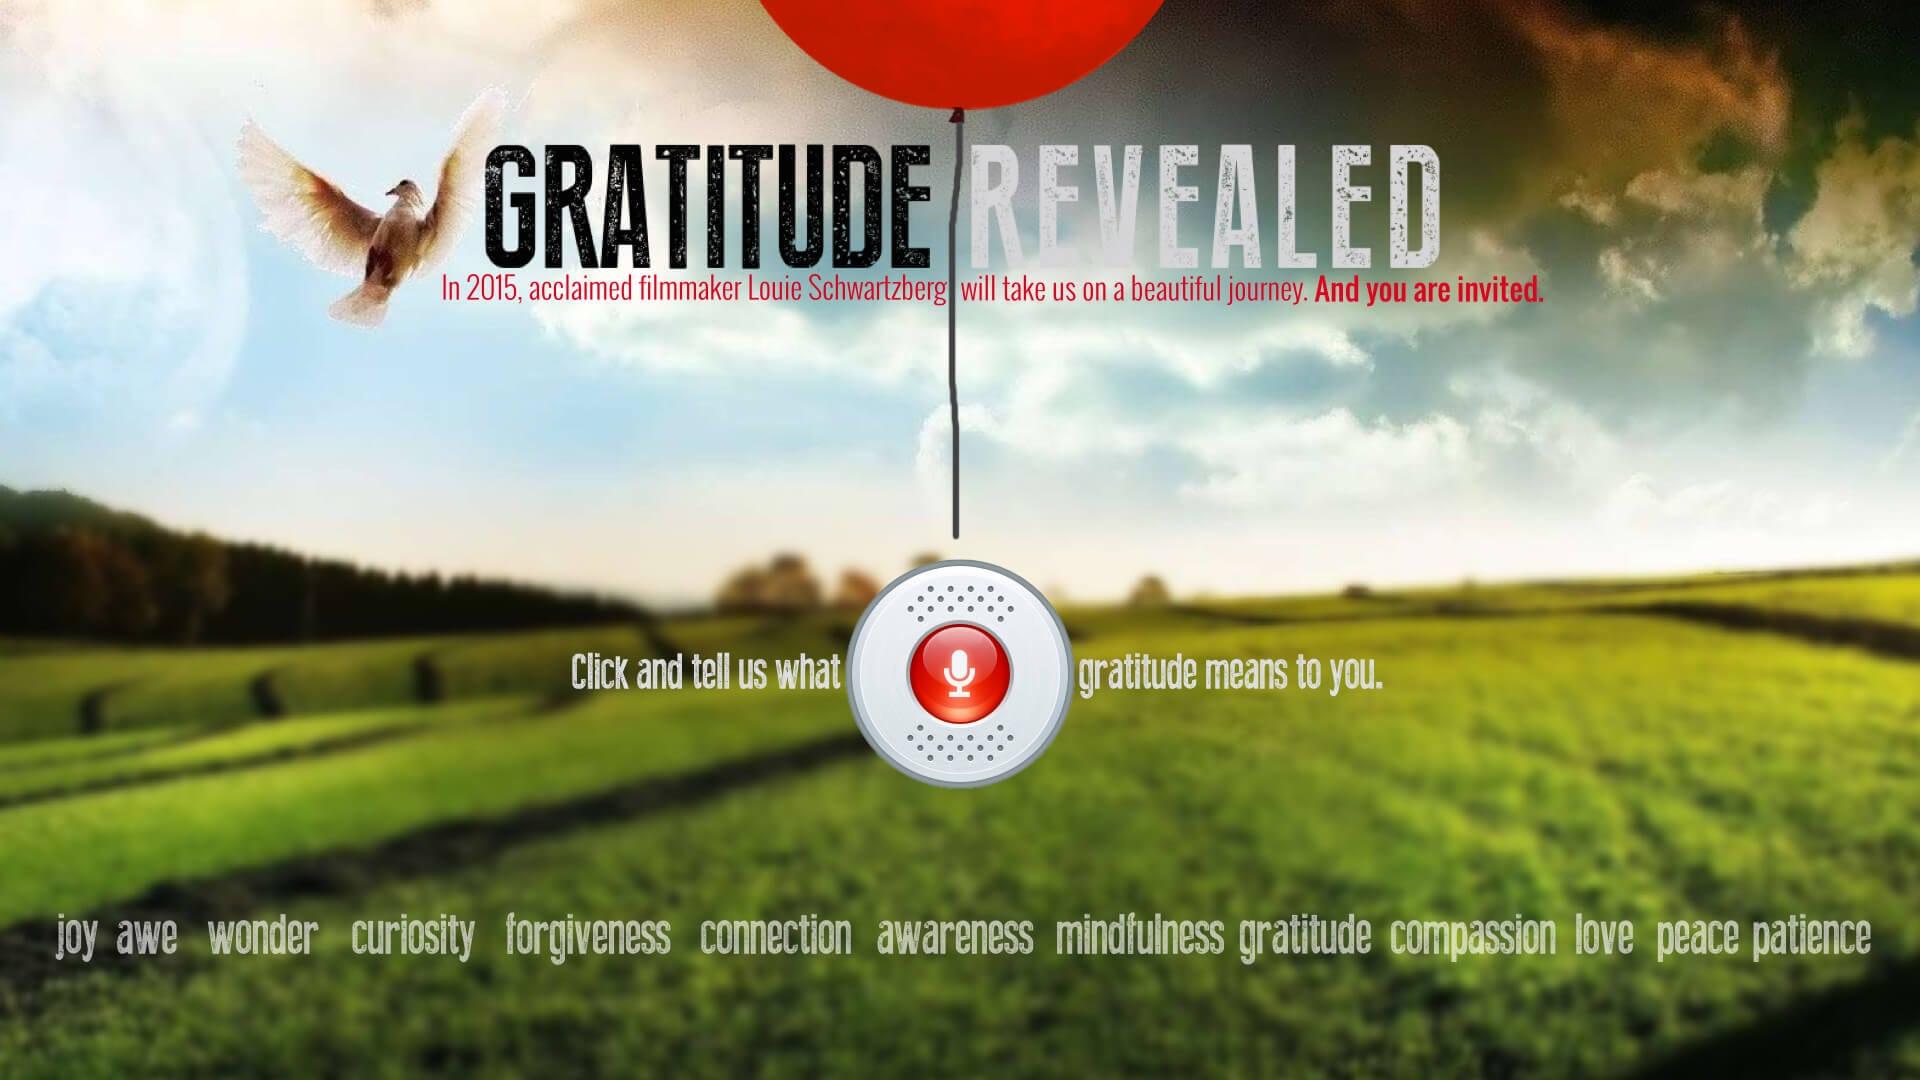 Gratitude Revealed - Join The Journey